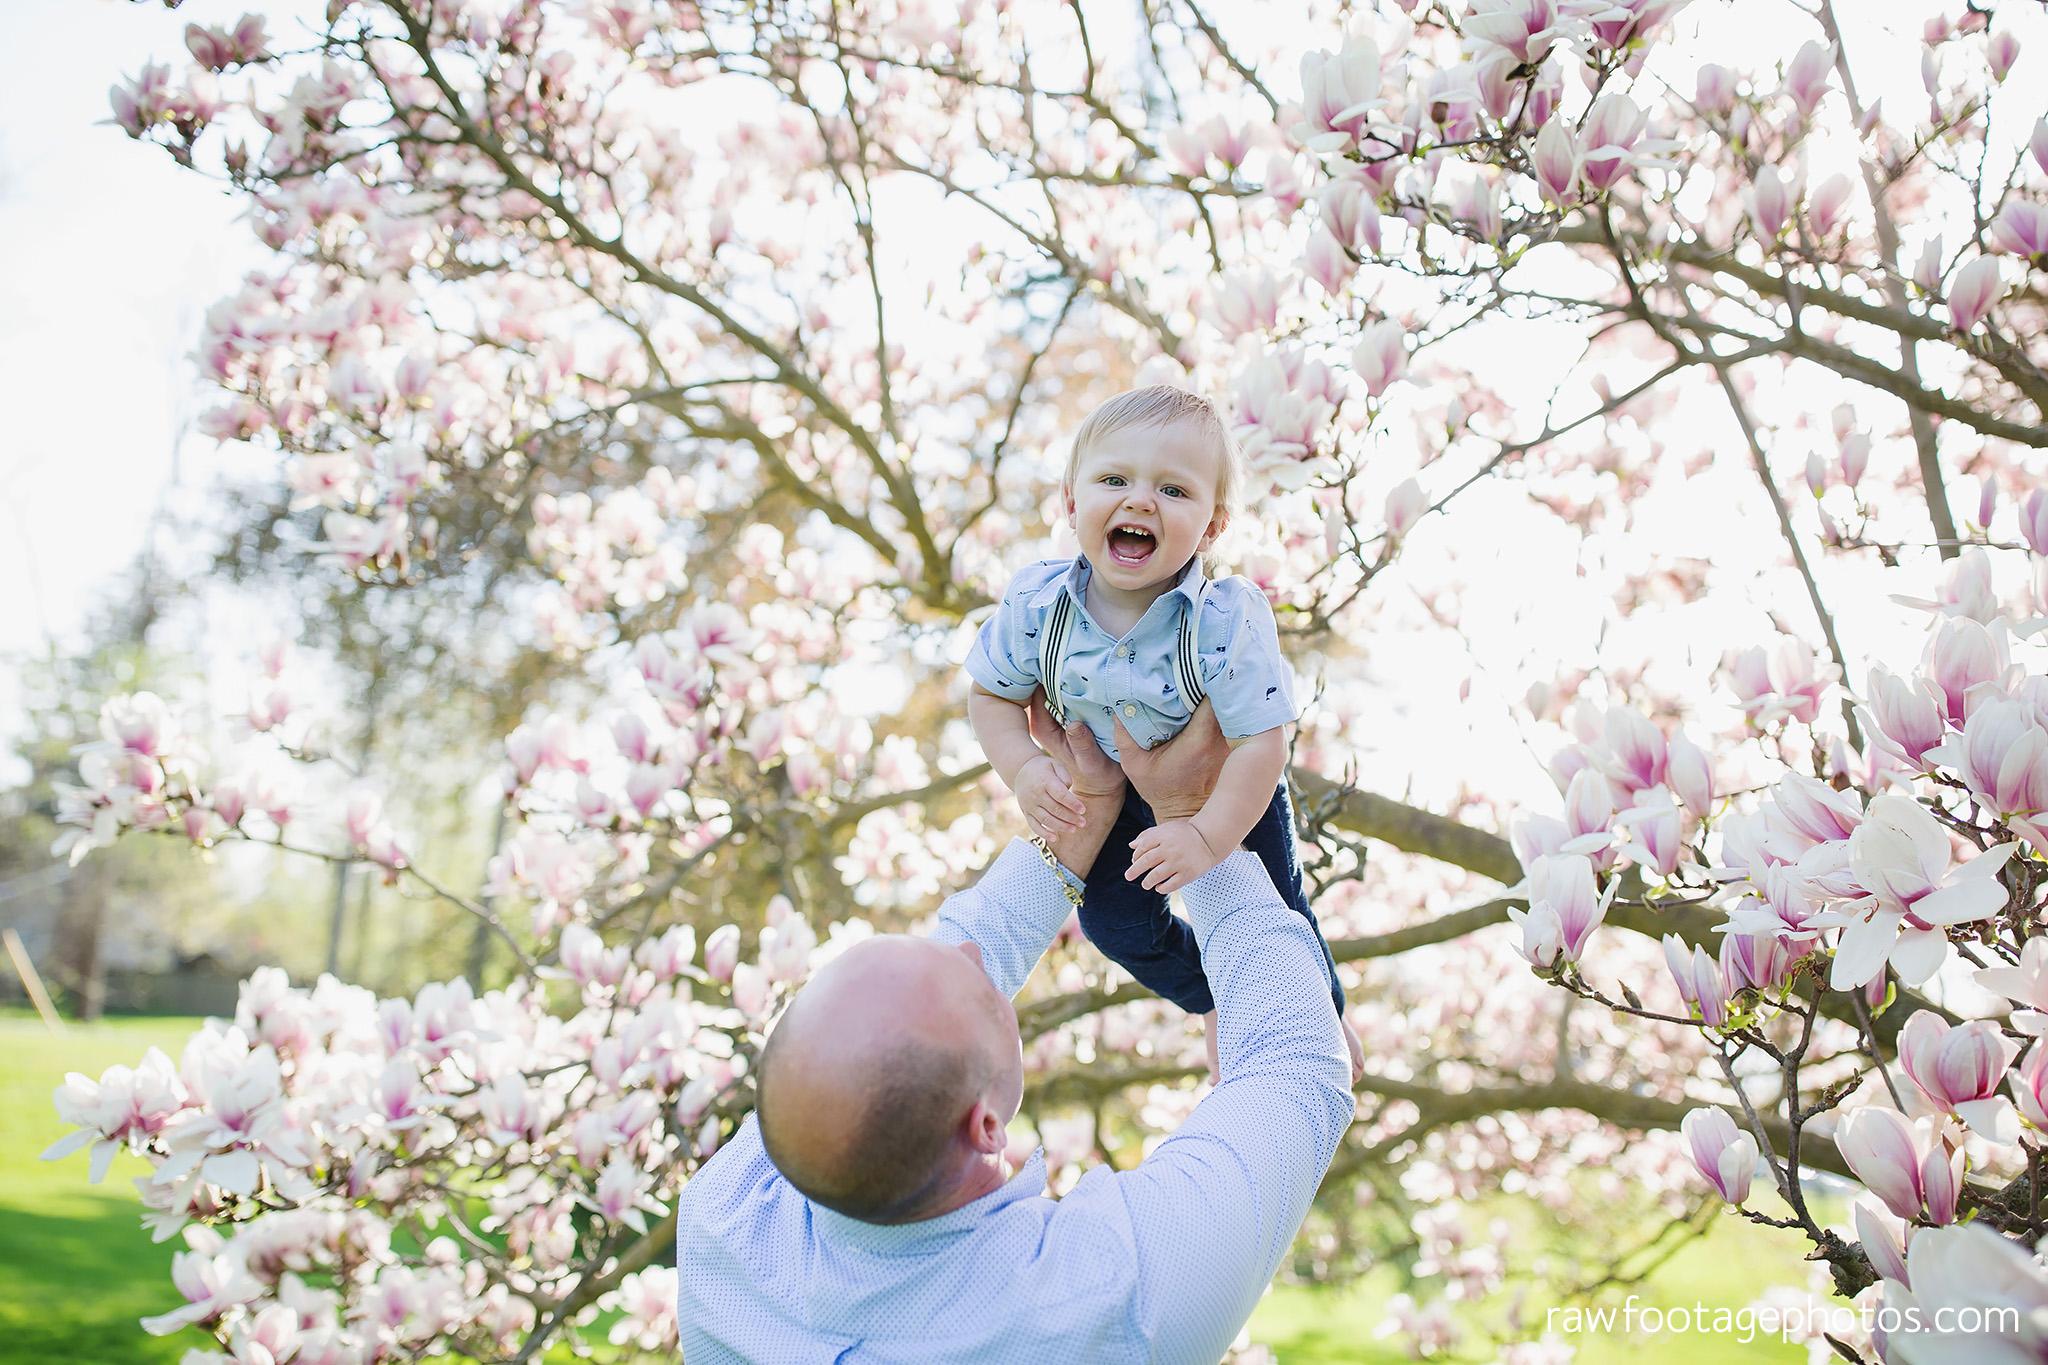 london_ontario_family_photographer-raw_footage_photography-spring_blossom_mini_sessions-magnolia-springbank_park020.jpg